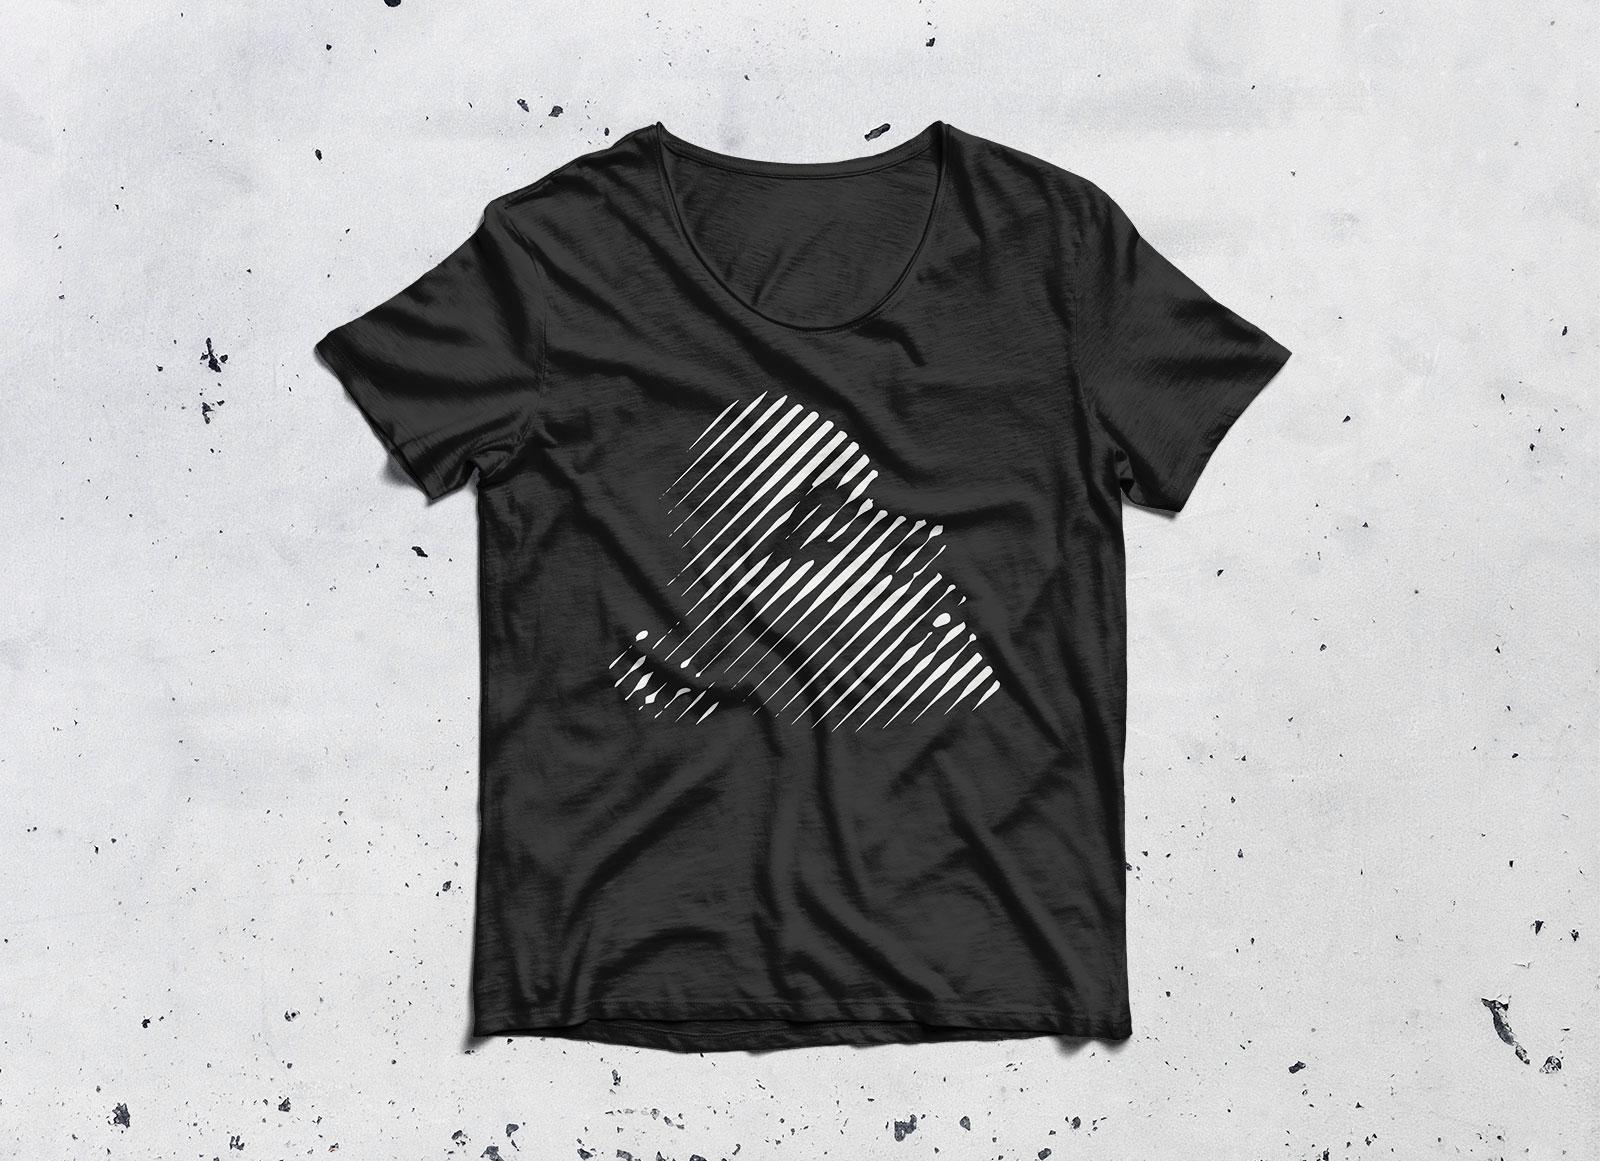 black t shirt mockup 4